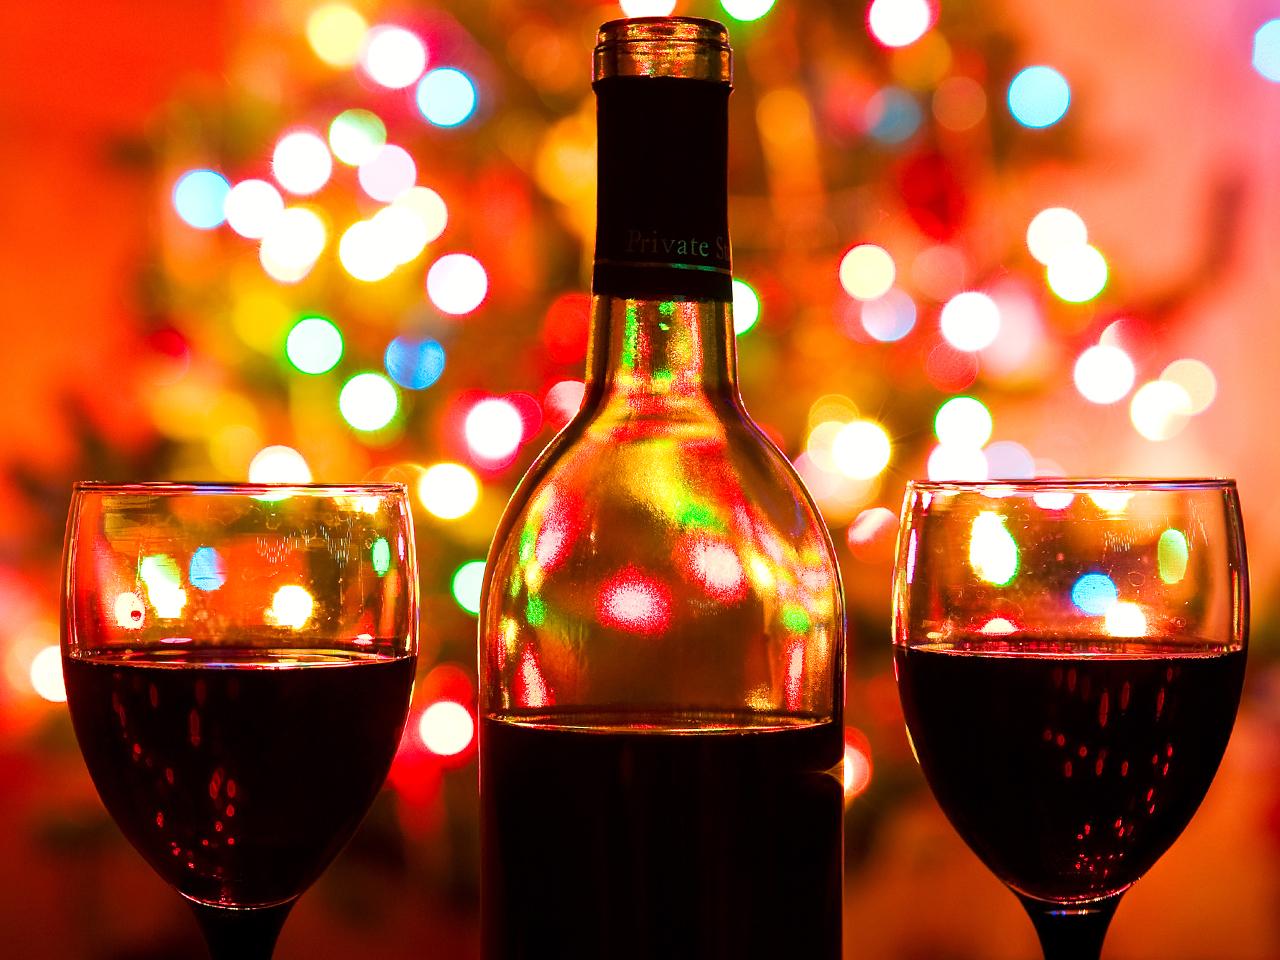 blog.winecollective.ca/